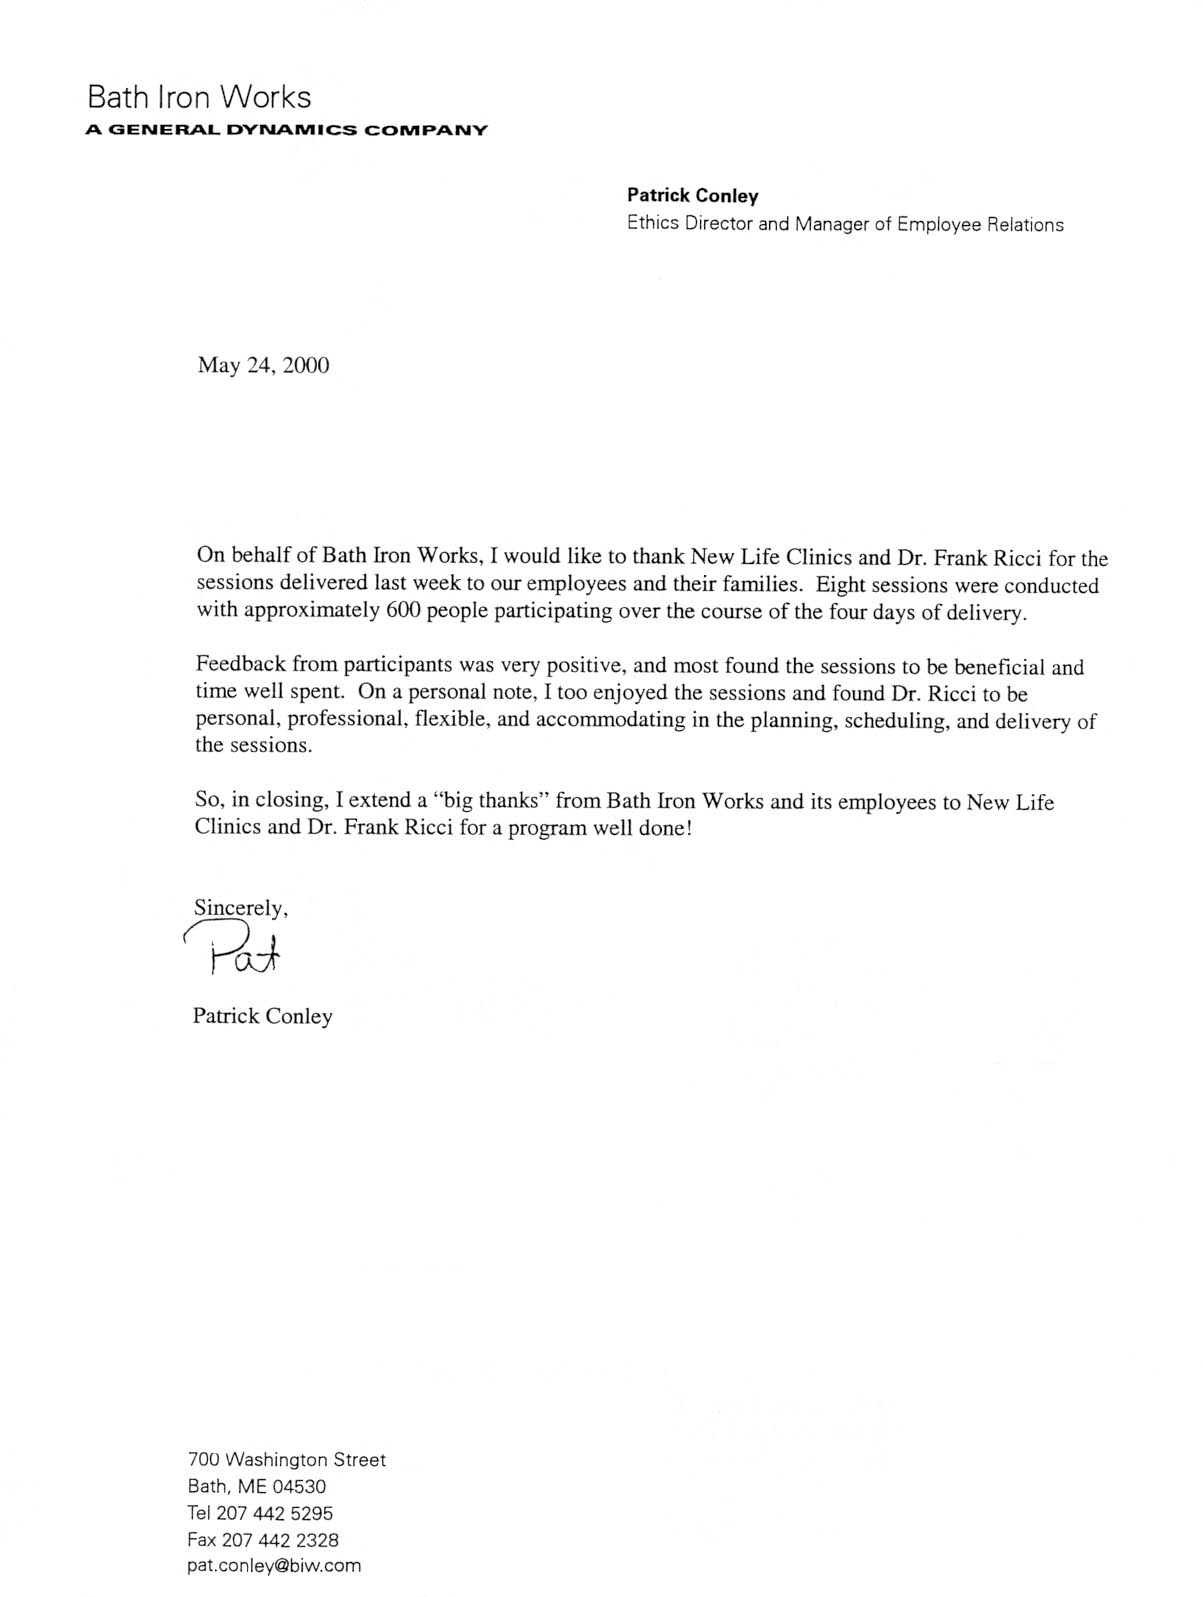 Doc404536 Endorsement Letter for Employment Sample – Endorsement Letter for Employment